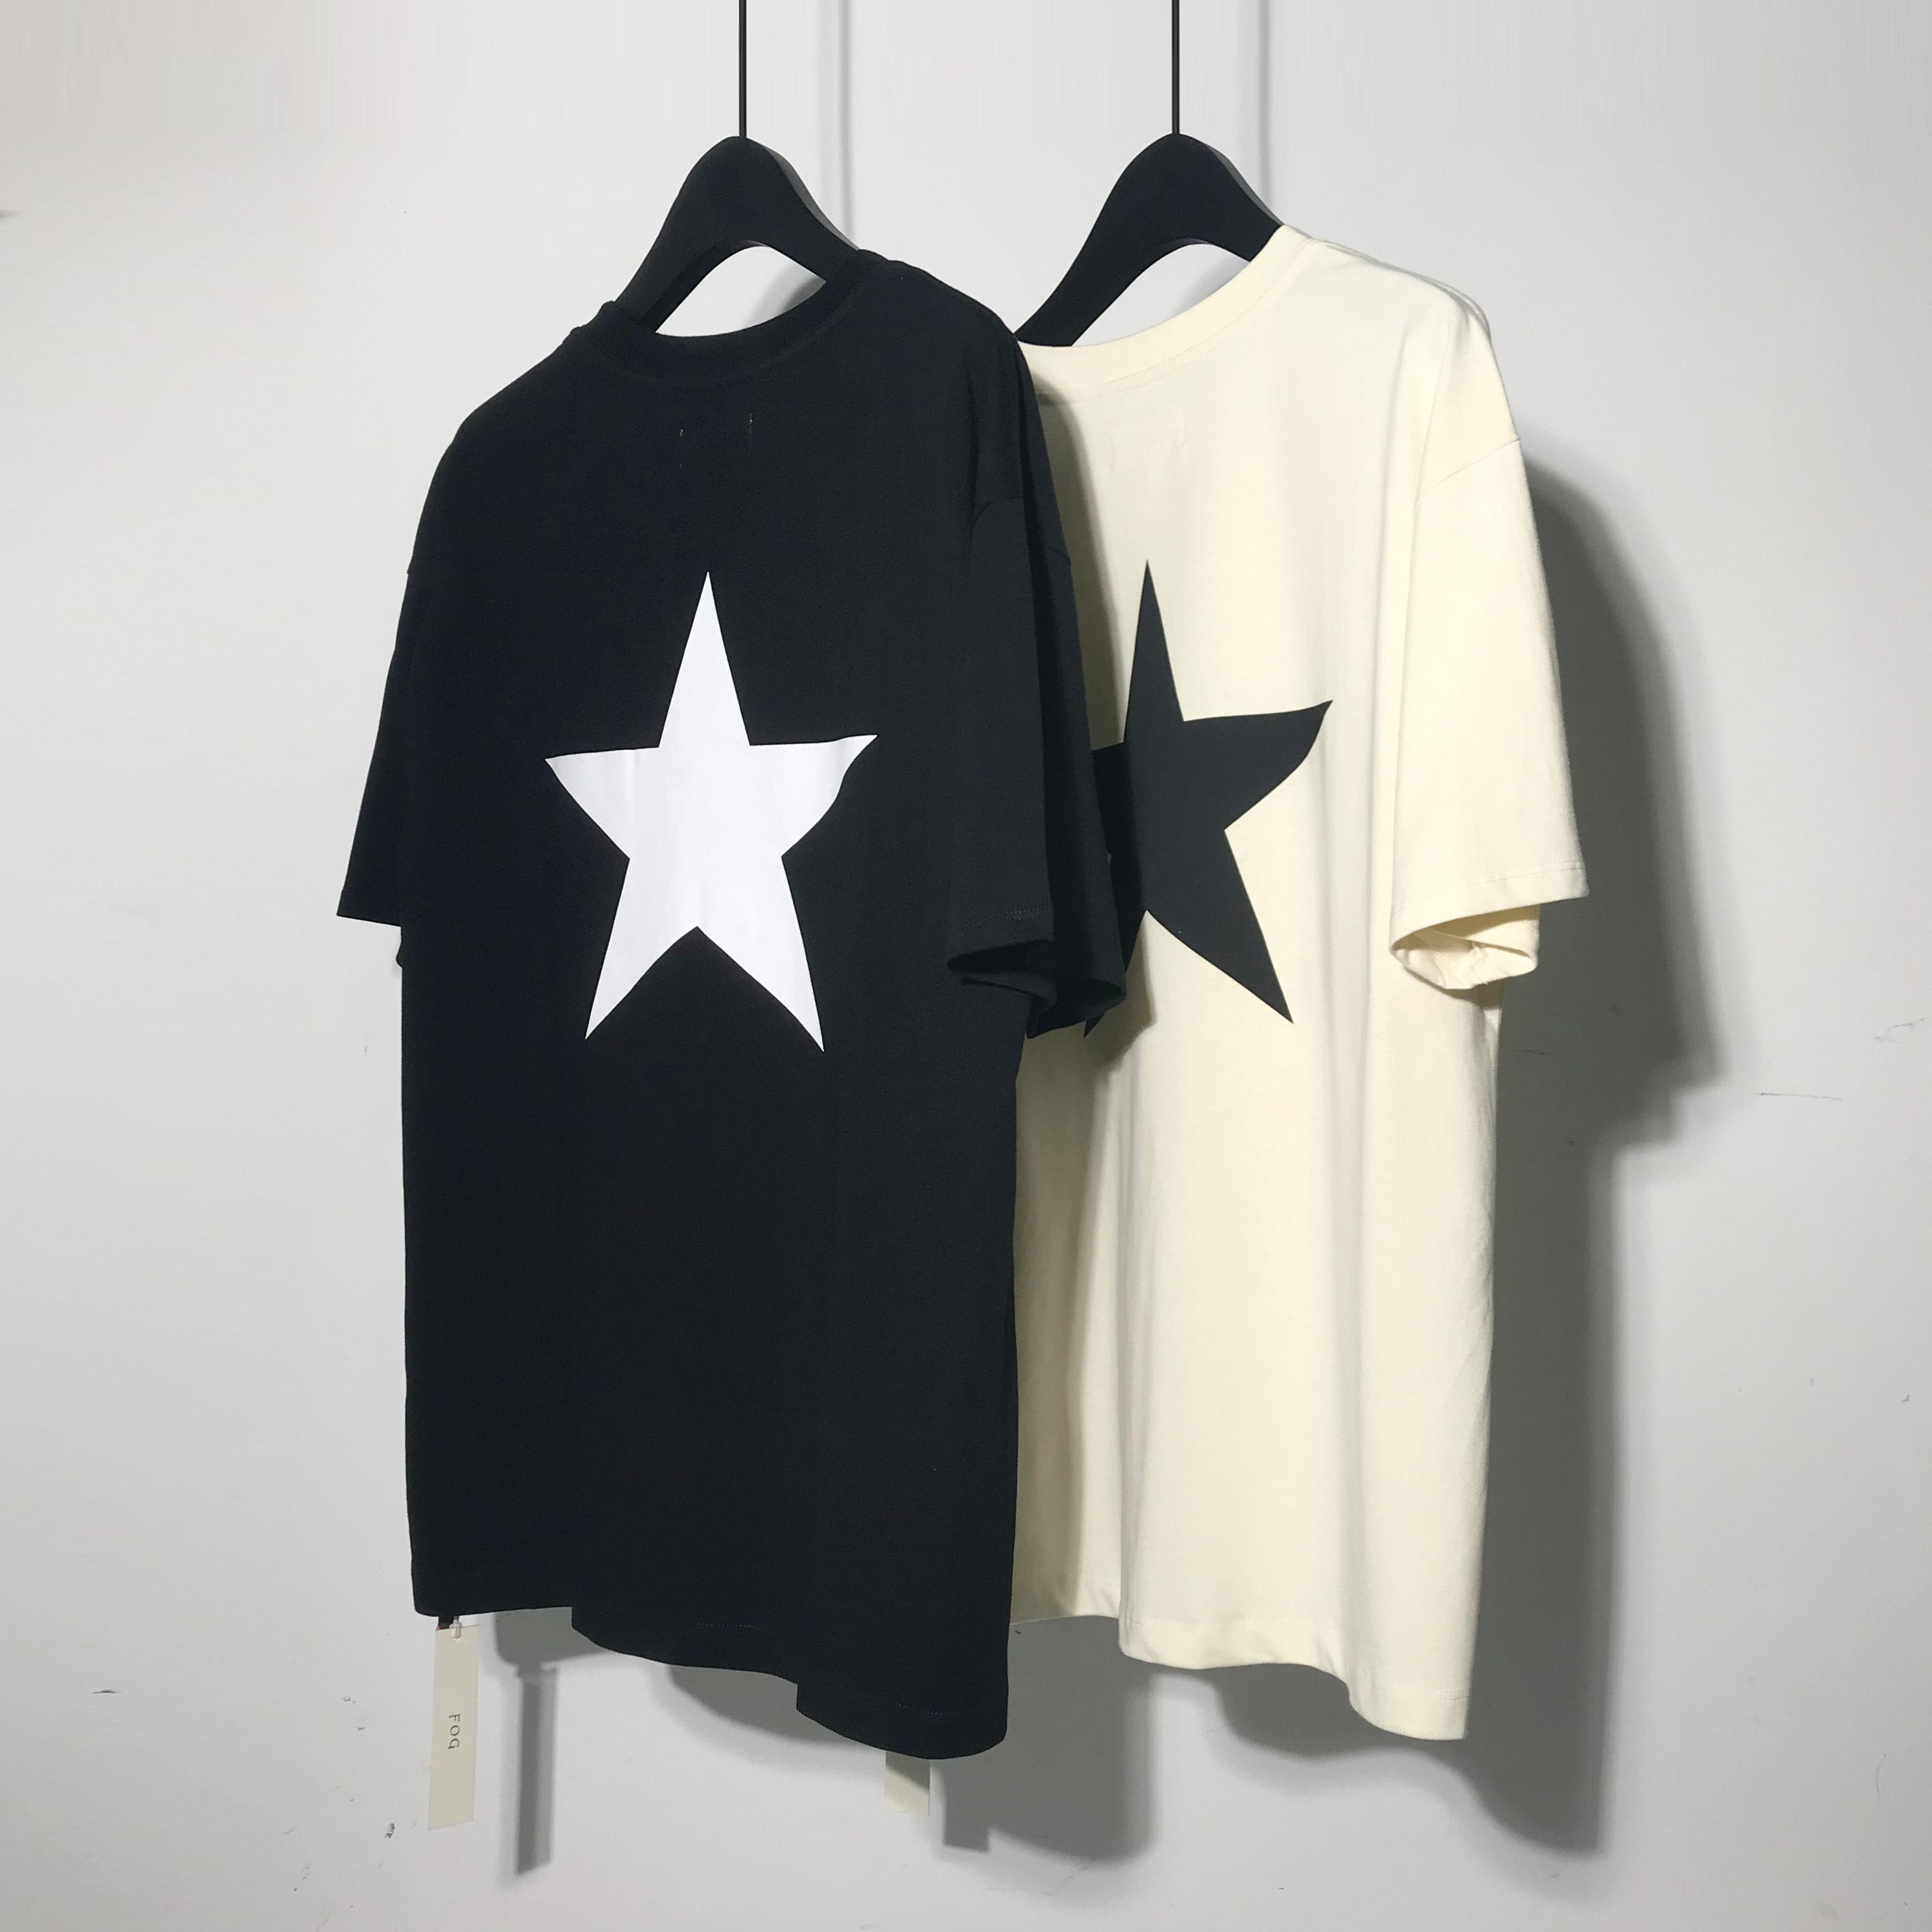 Kanye maglietta 2019 Solid Mens Summer Dress Pentagramma maglietta Stagione 5 Kanye West cotone grigio maglietta oversize Kanye dimensioni MX200509